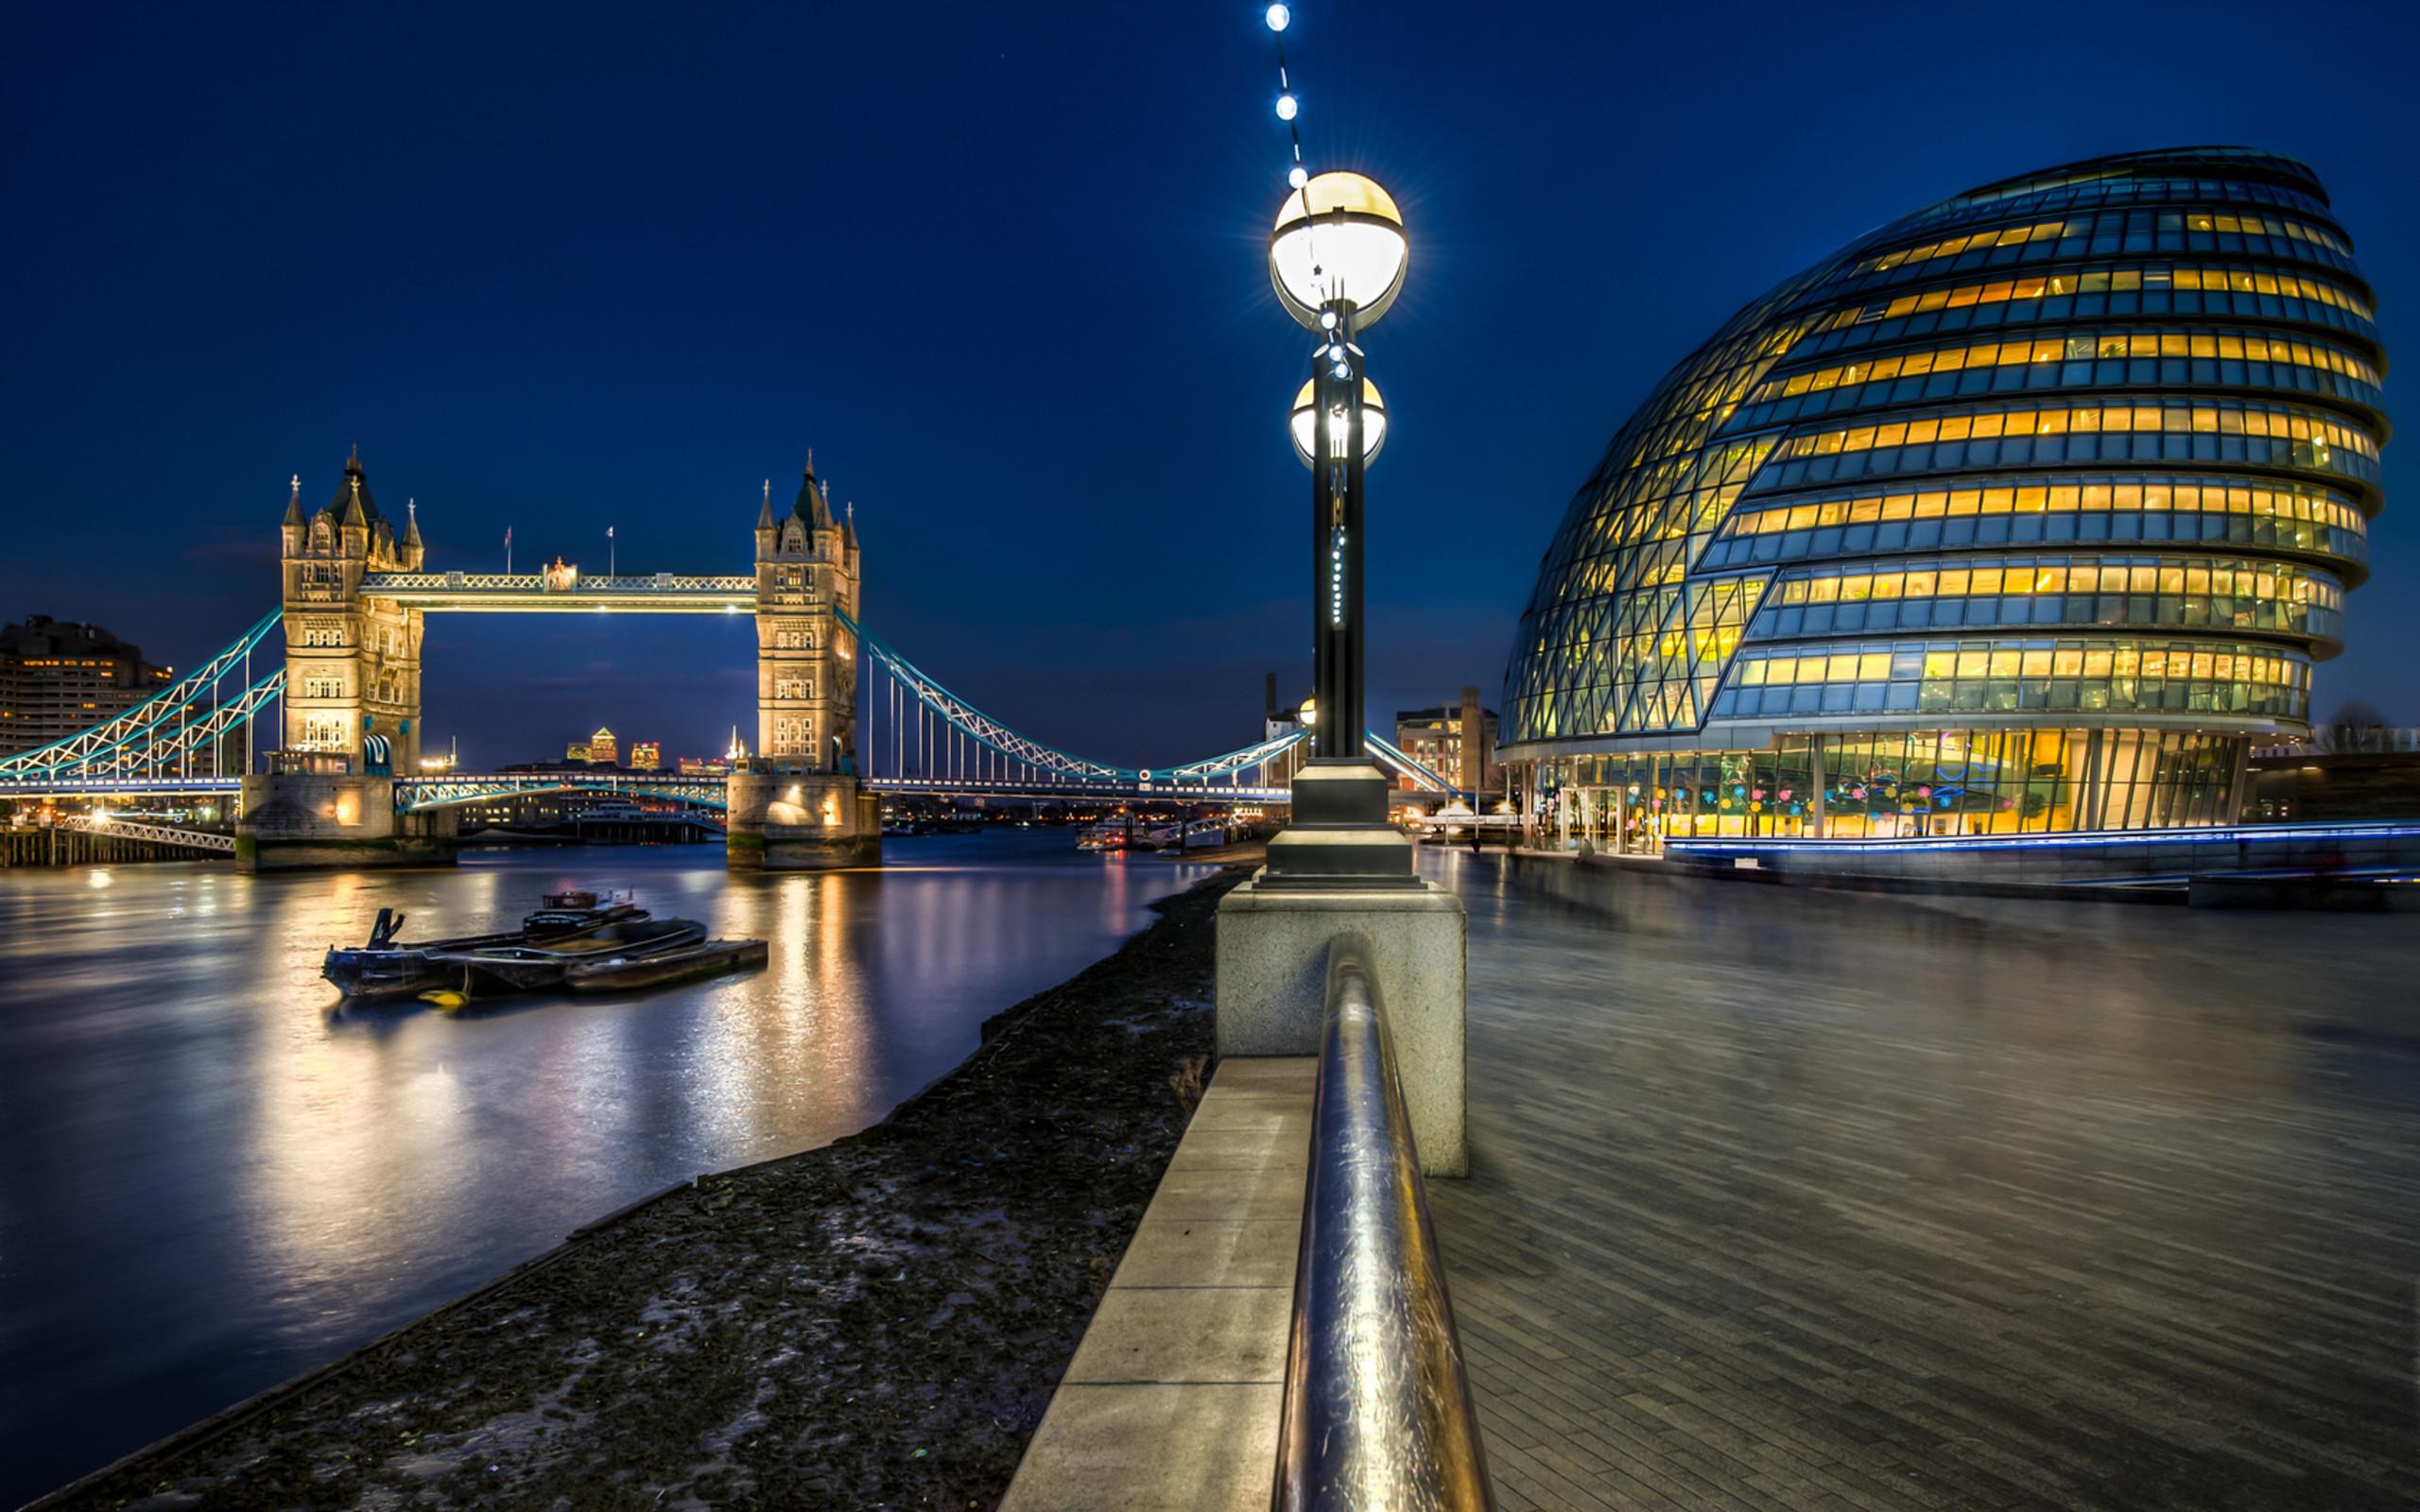 Res: 2560x1600, Tower Bridge